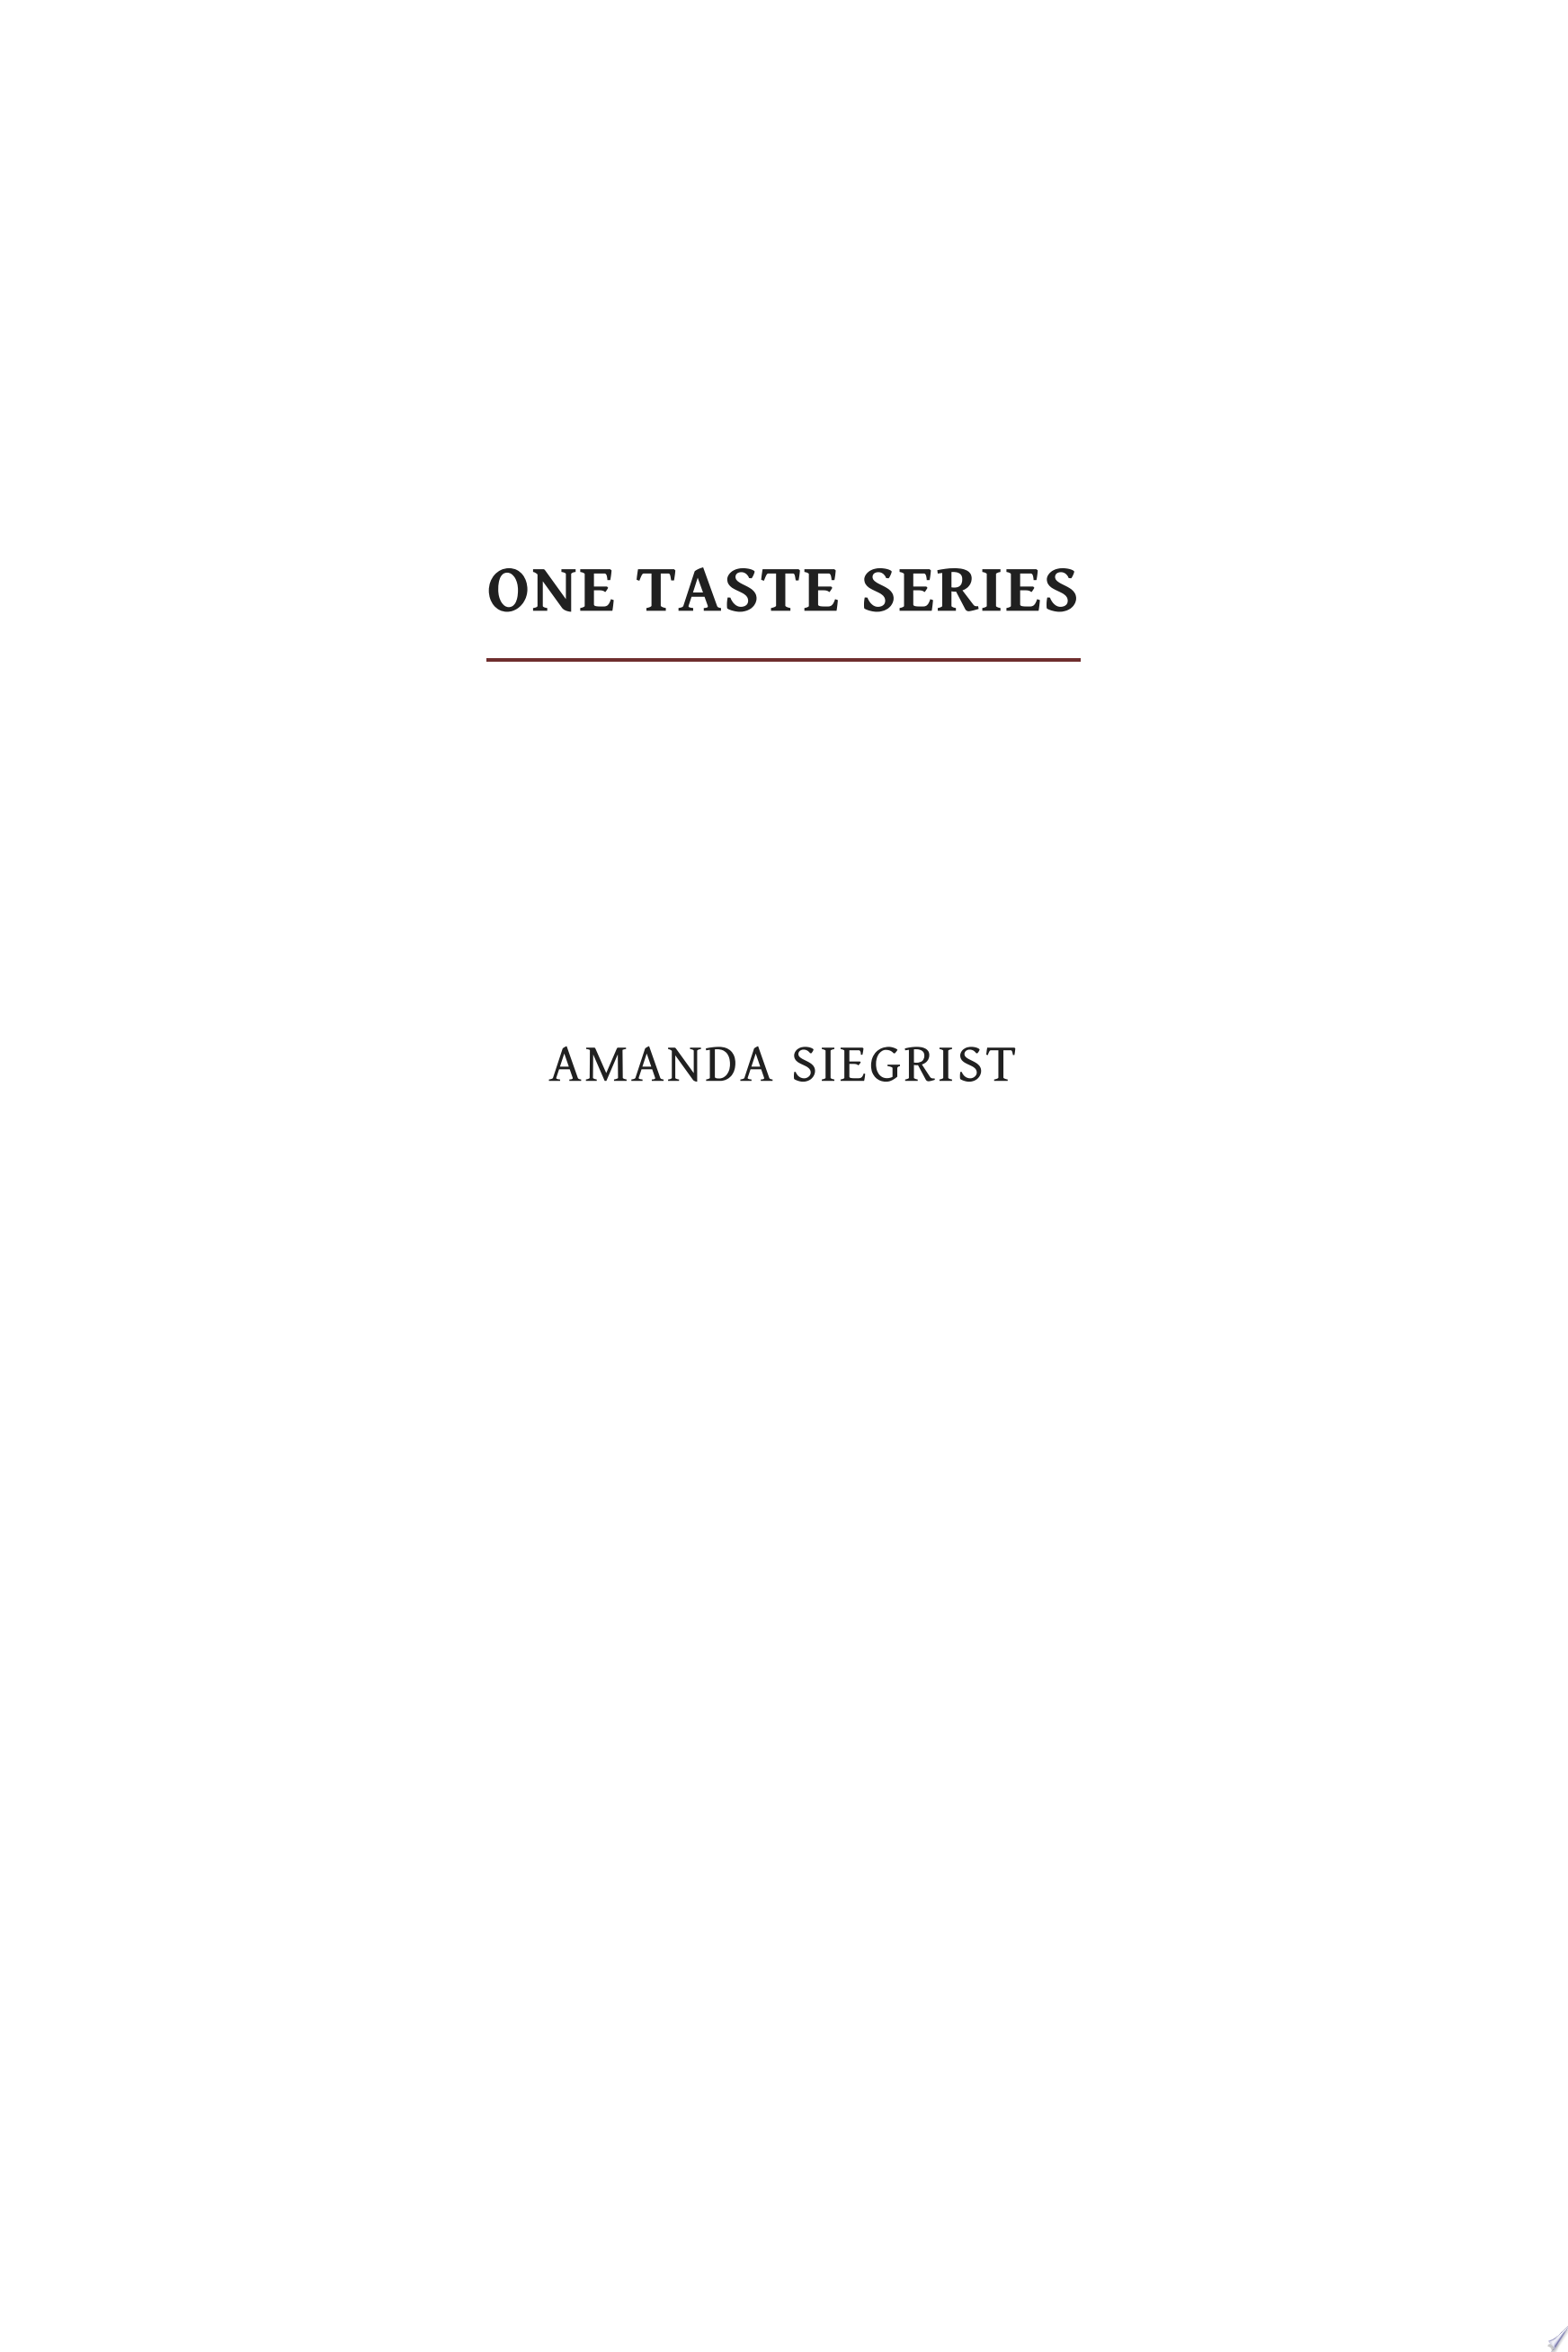 The One Taste Series Box Set (Books 1-4)